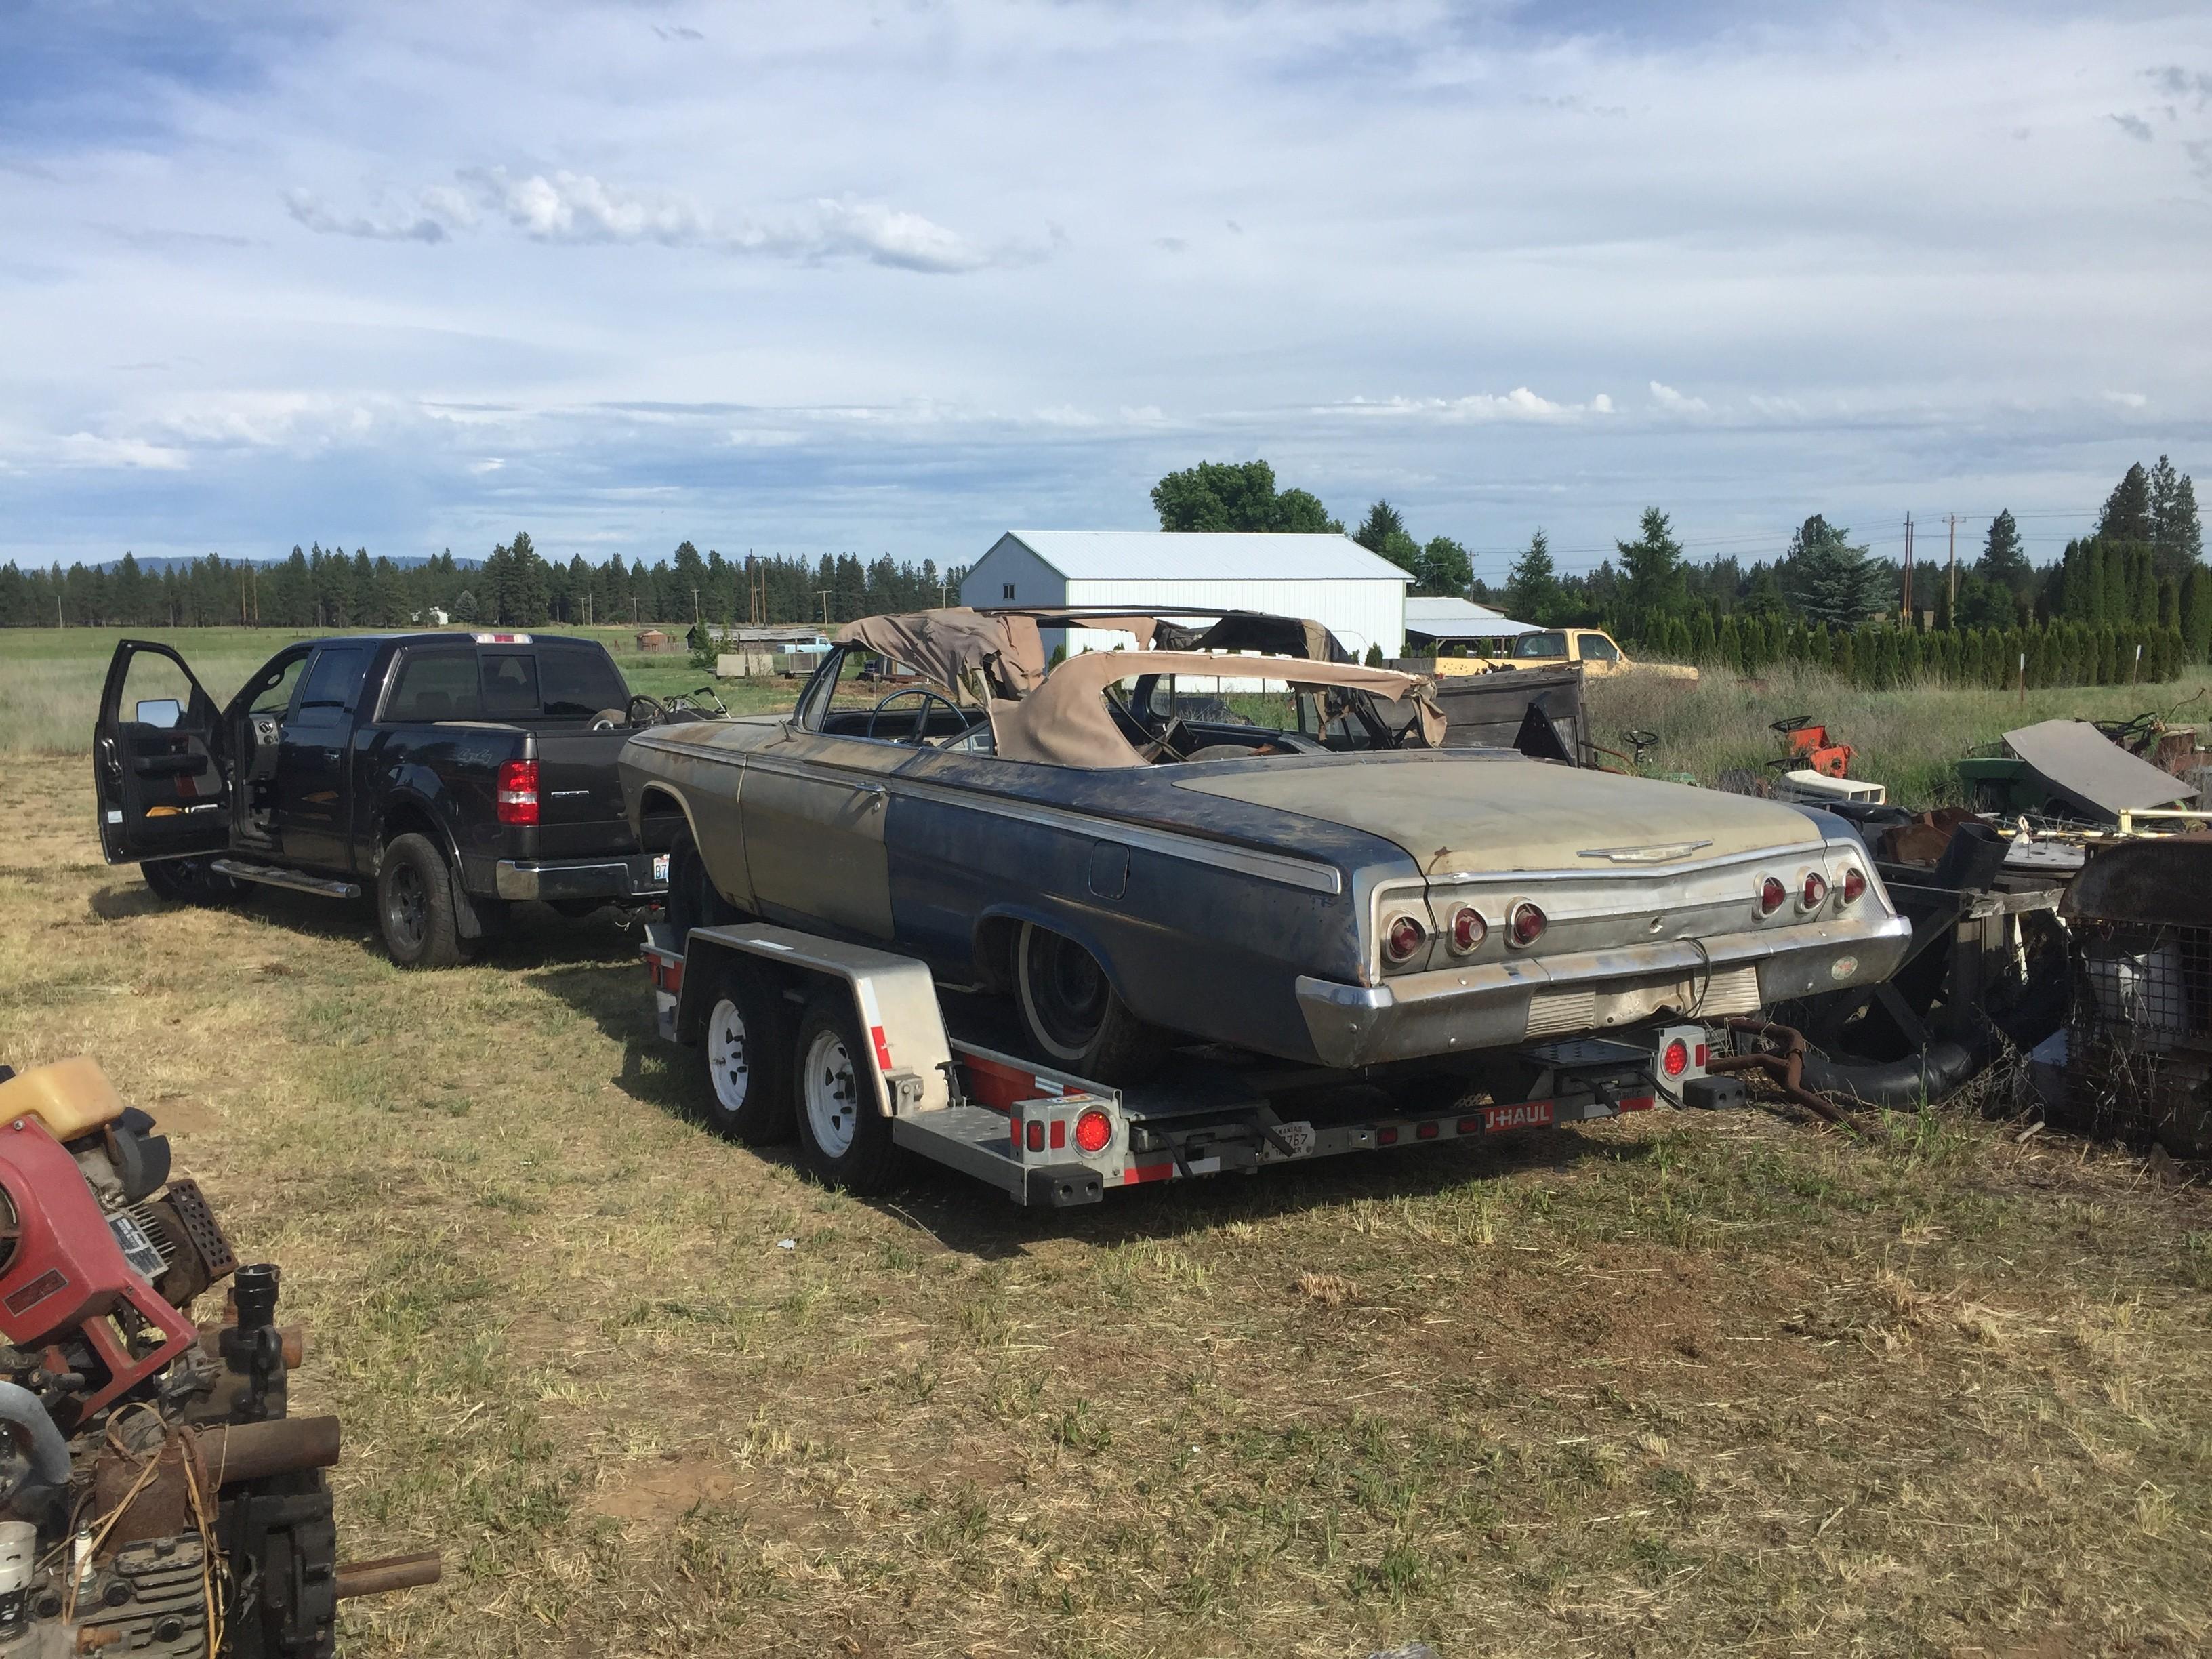 62 Impala SS Barn Find